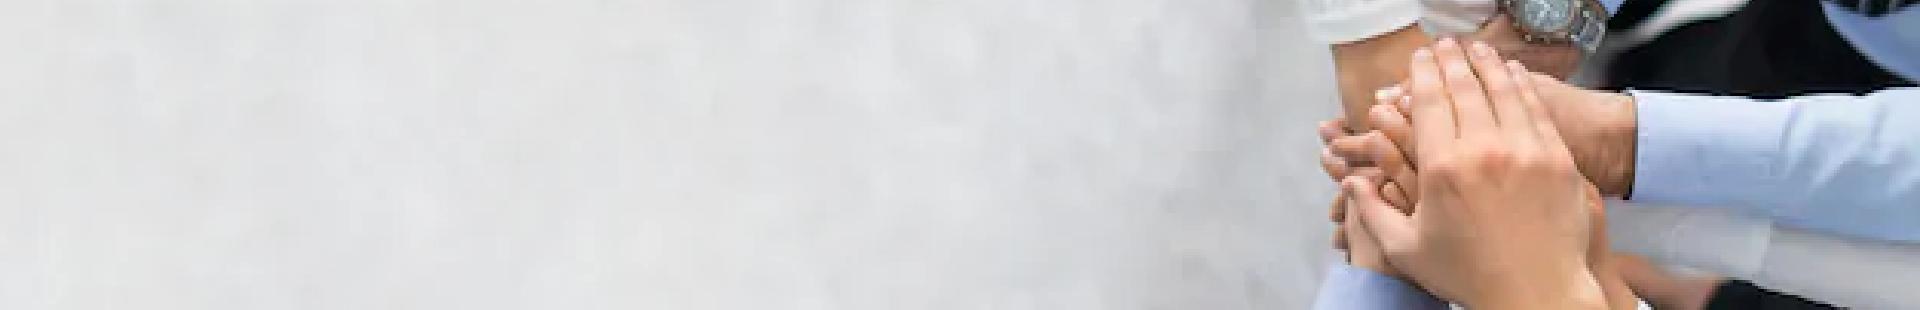 [field:brand_name/]